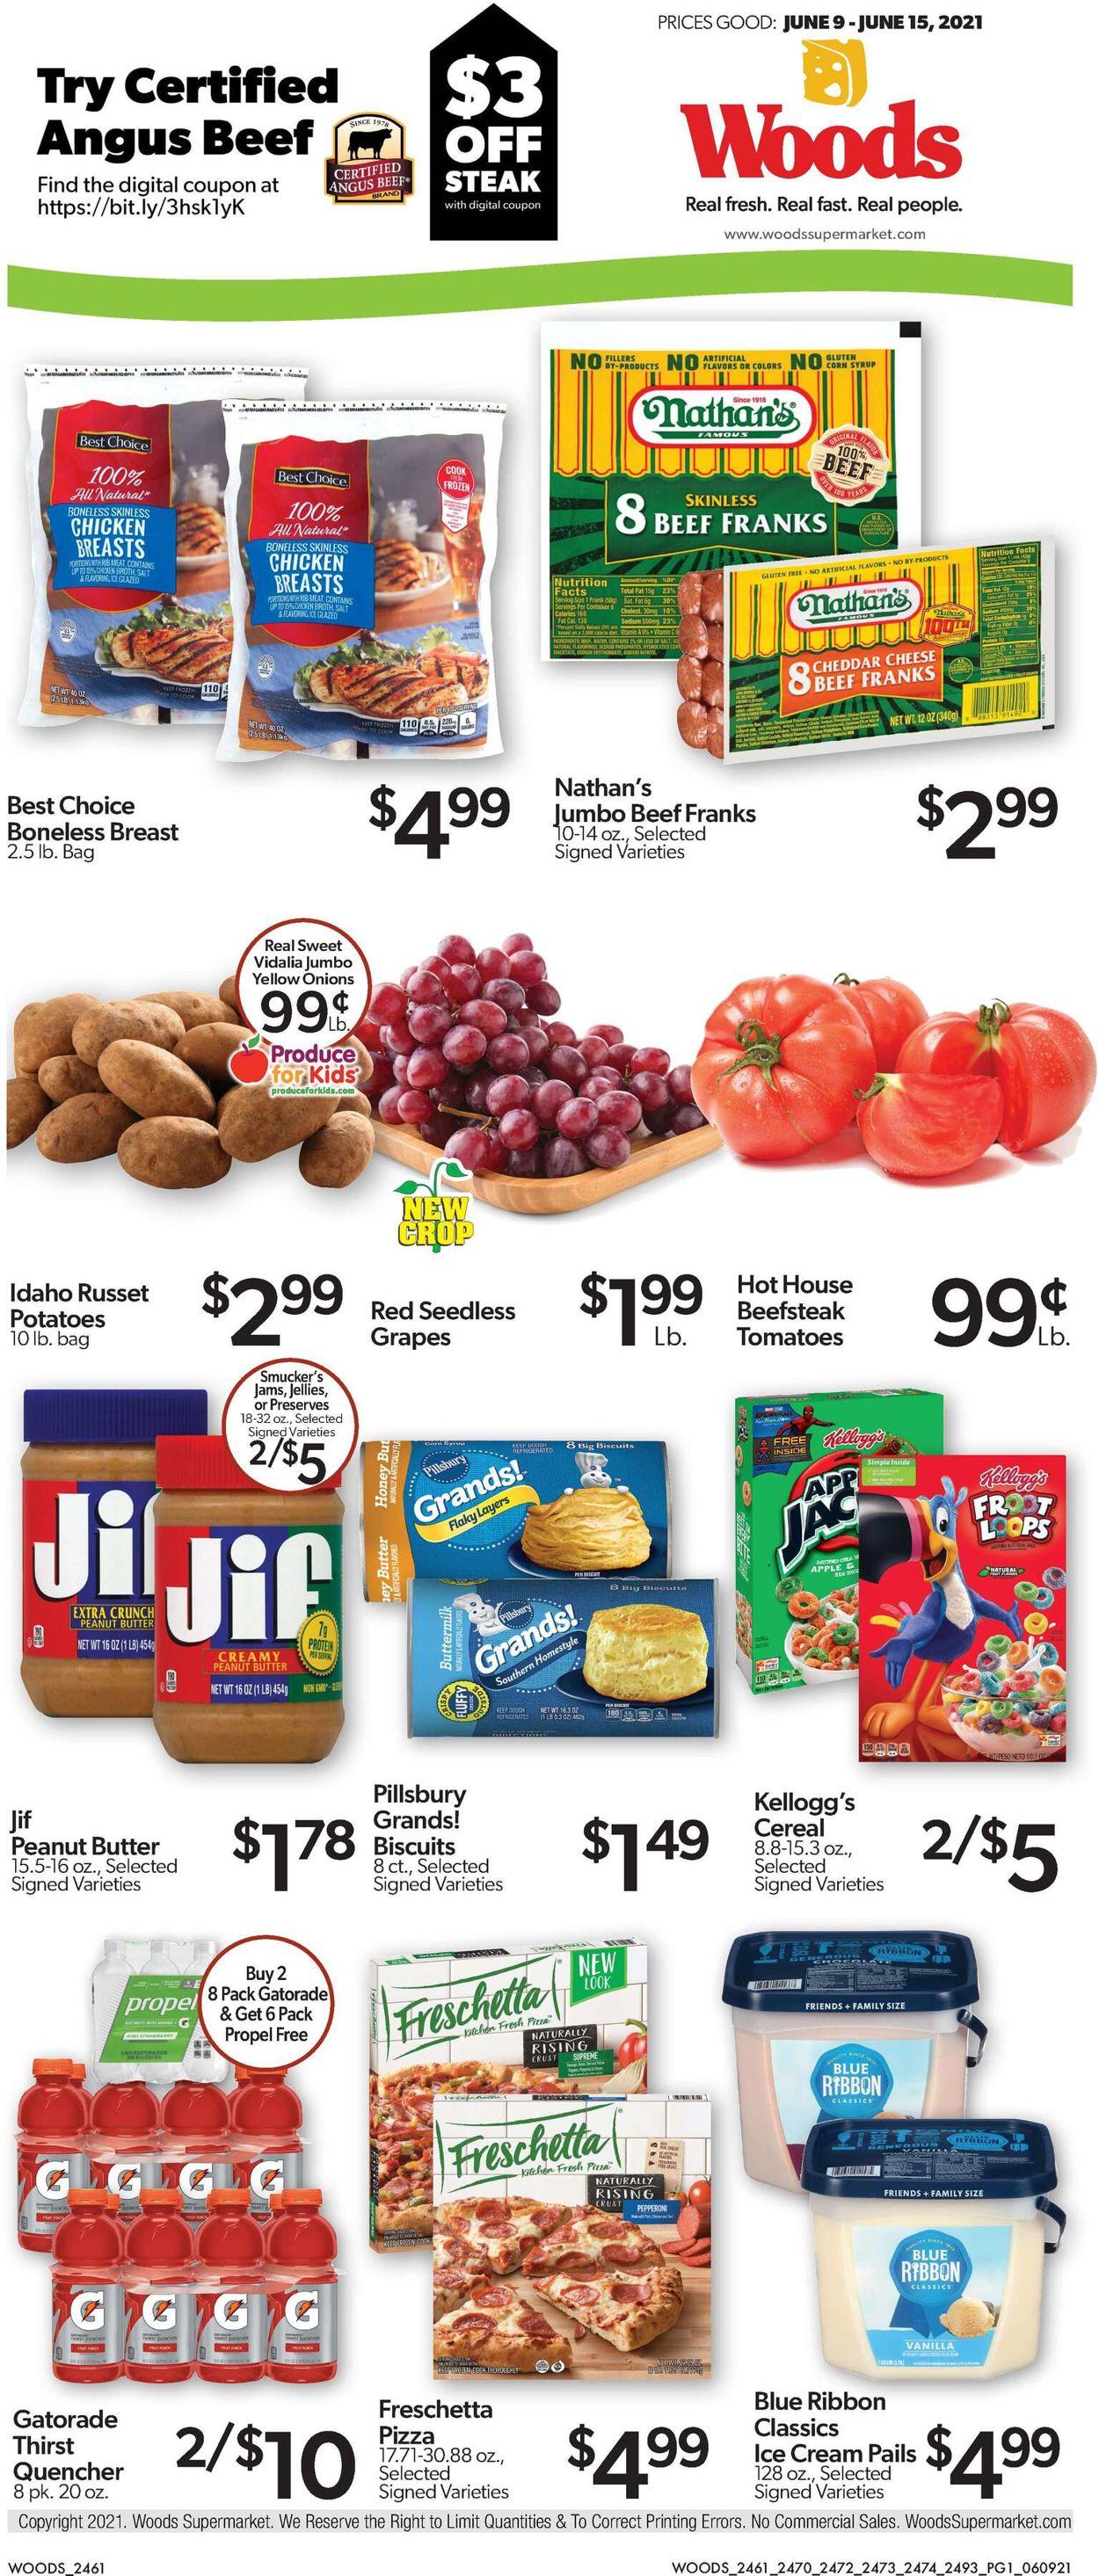 Woods Supermarket Weekly Ad Circular - valid 06/09-06/15/2021